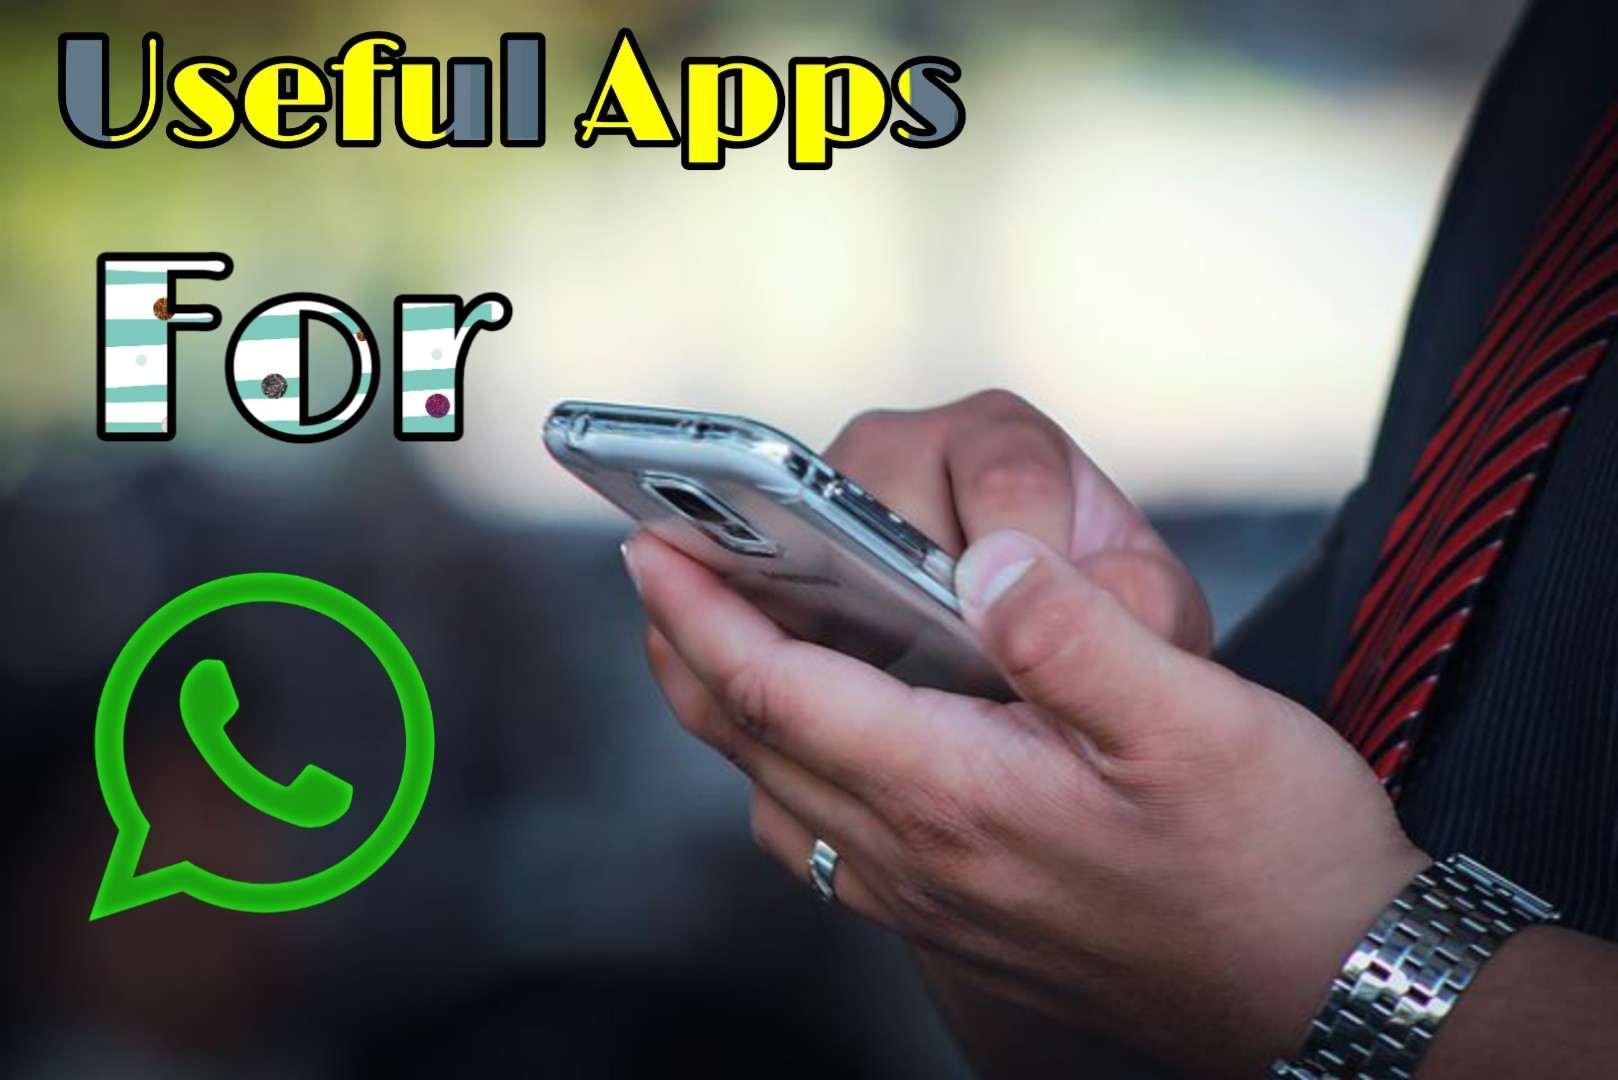 WhatsApp Ke Liye Top 5 Useful Apps For Android Phones